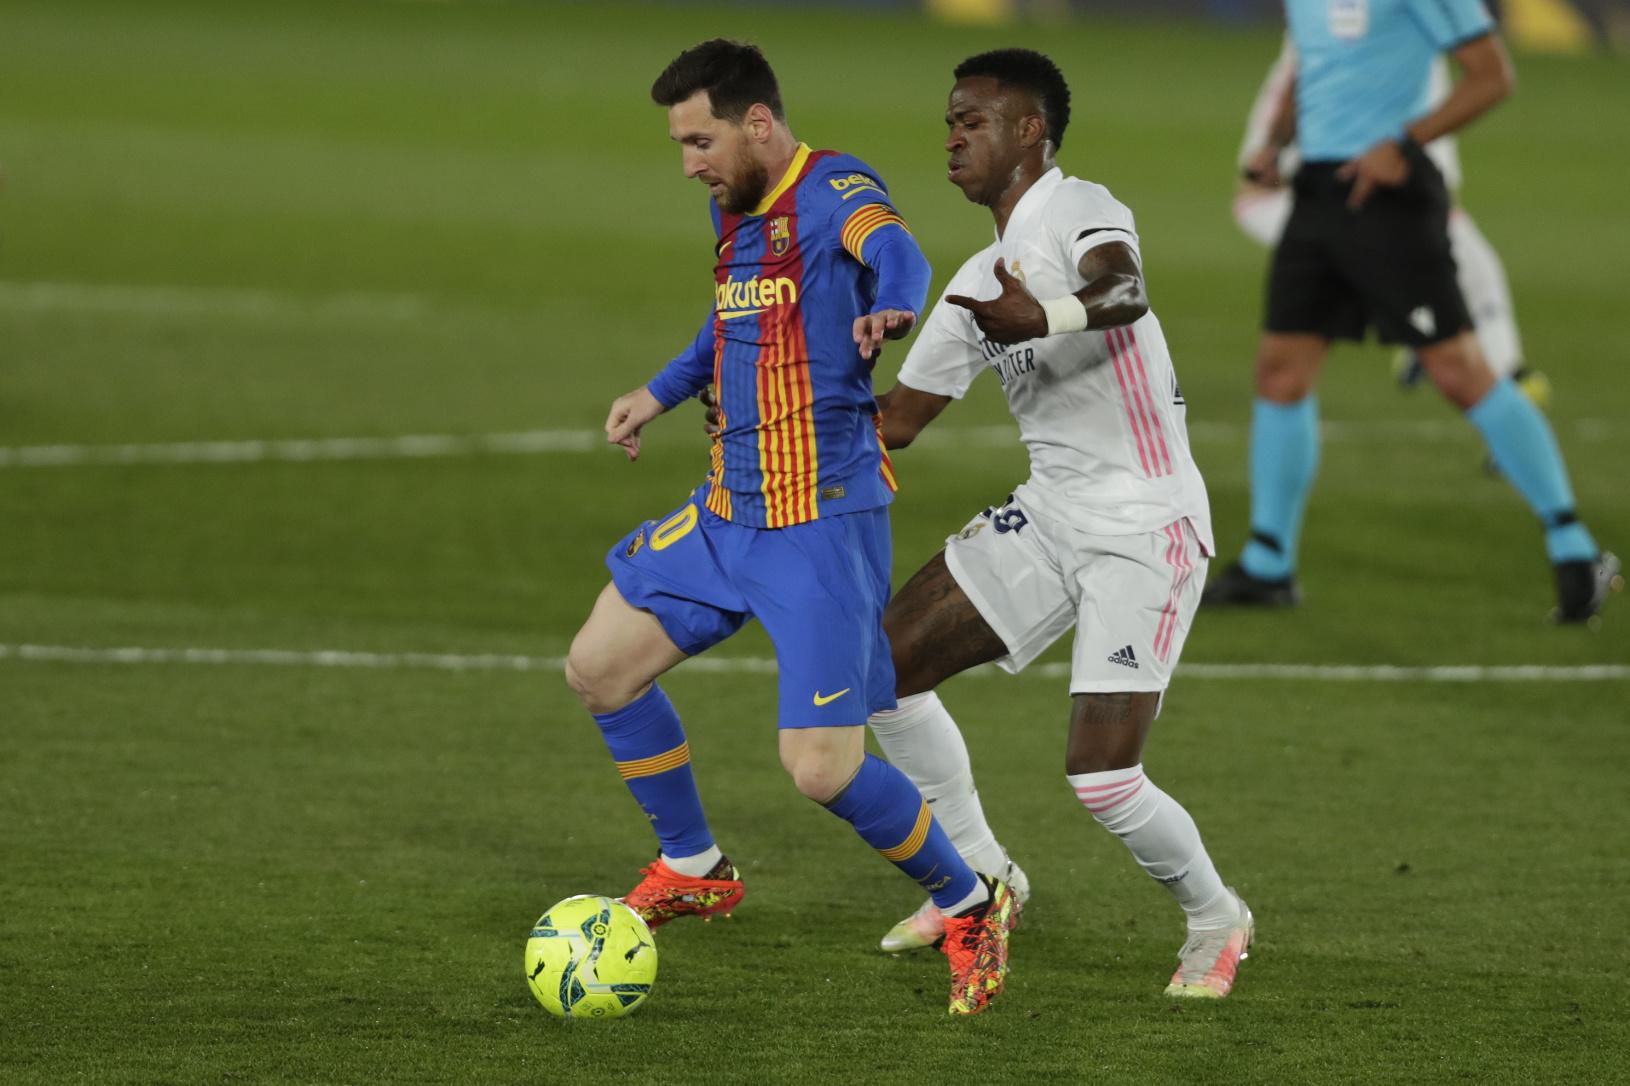 Lionel Messi vedie loptu